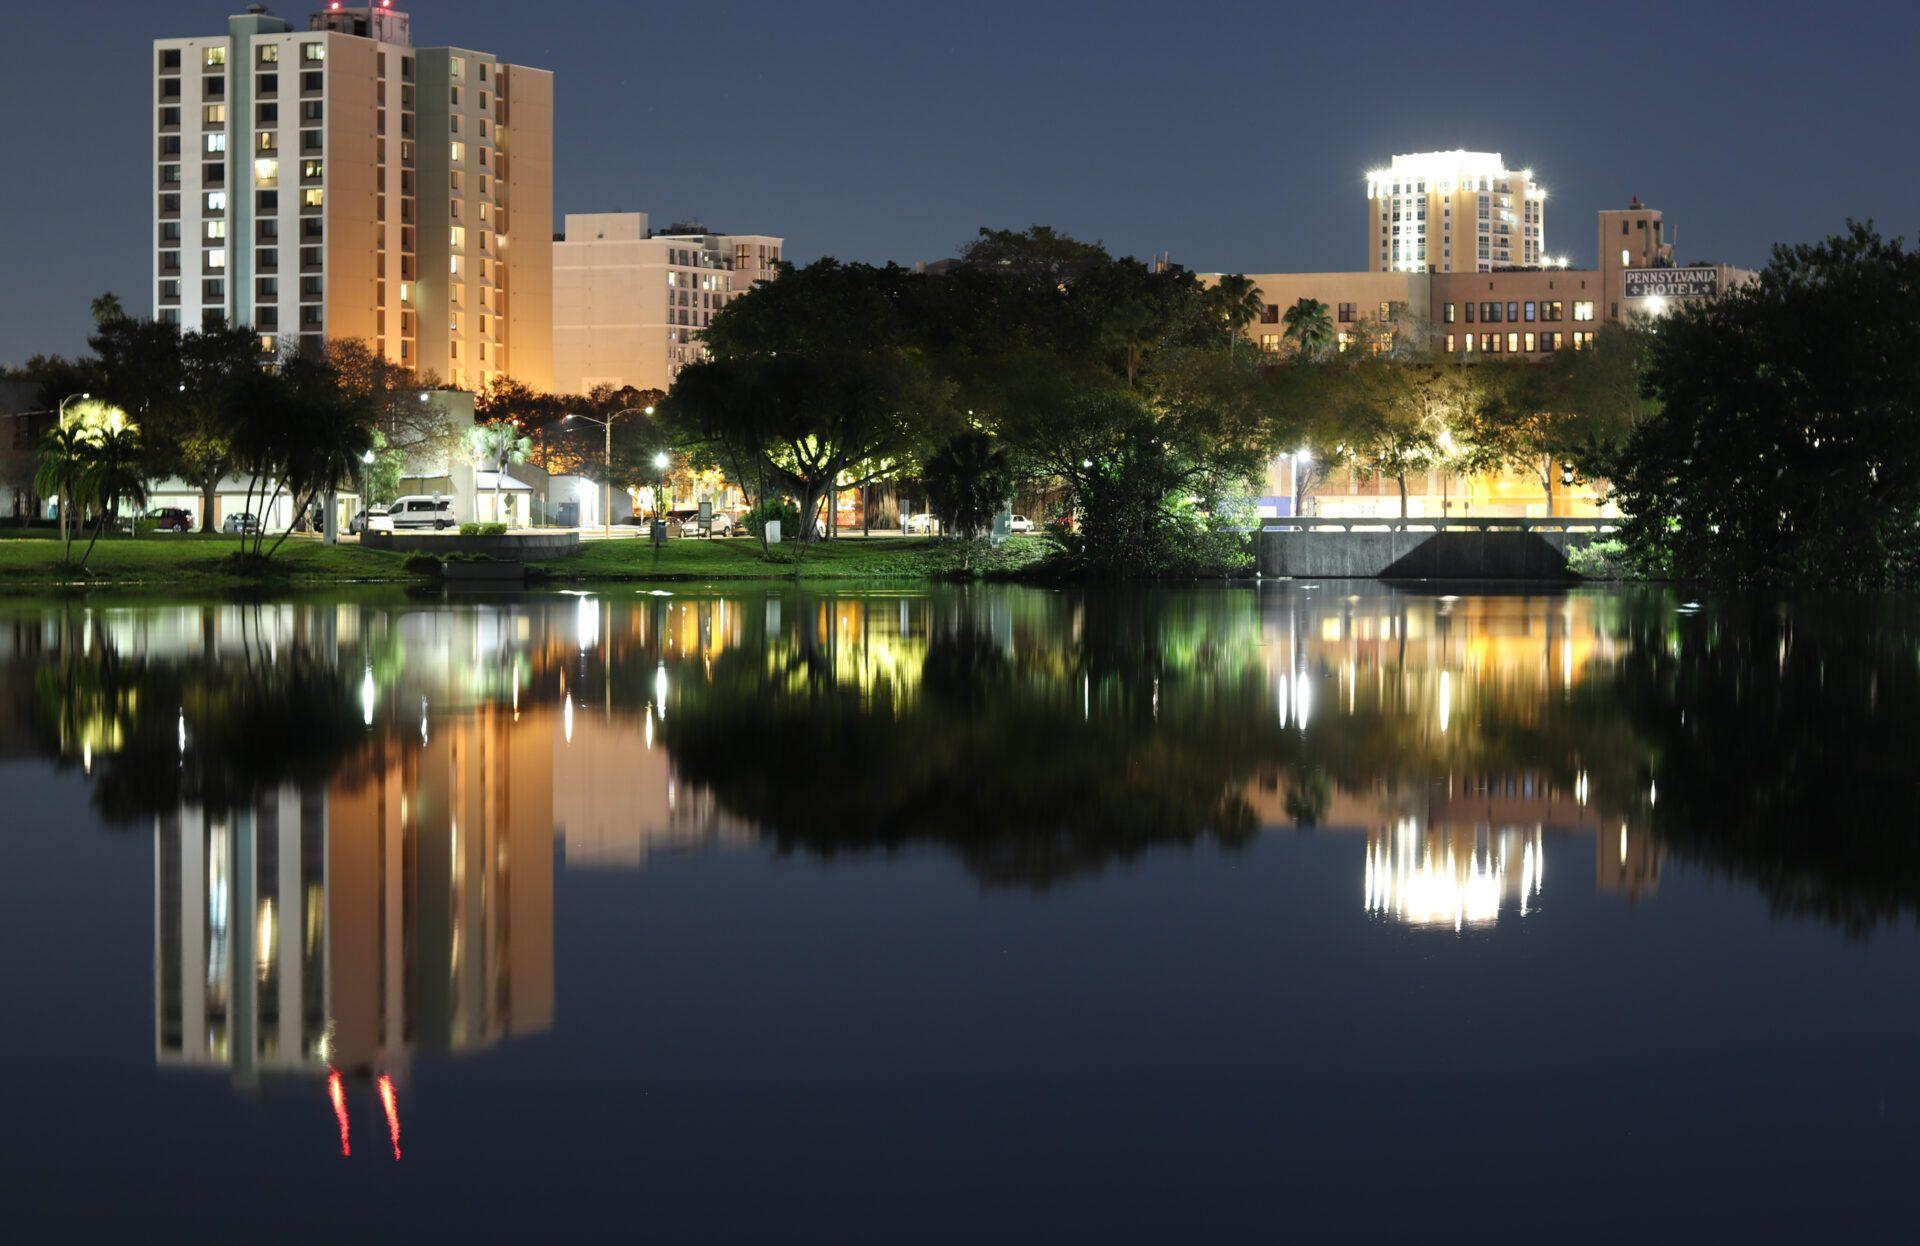 Mirror Lake Downtown St. Petersburg, FL